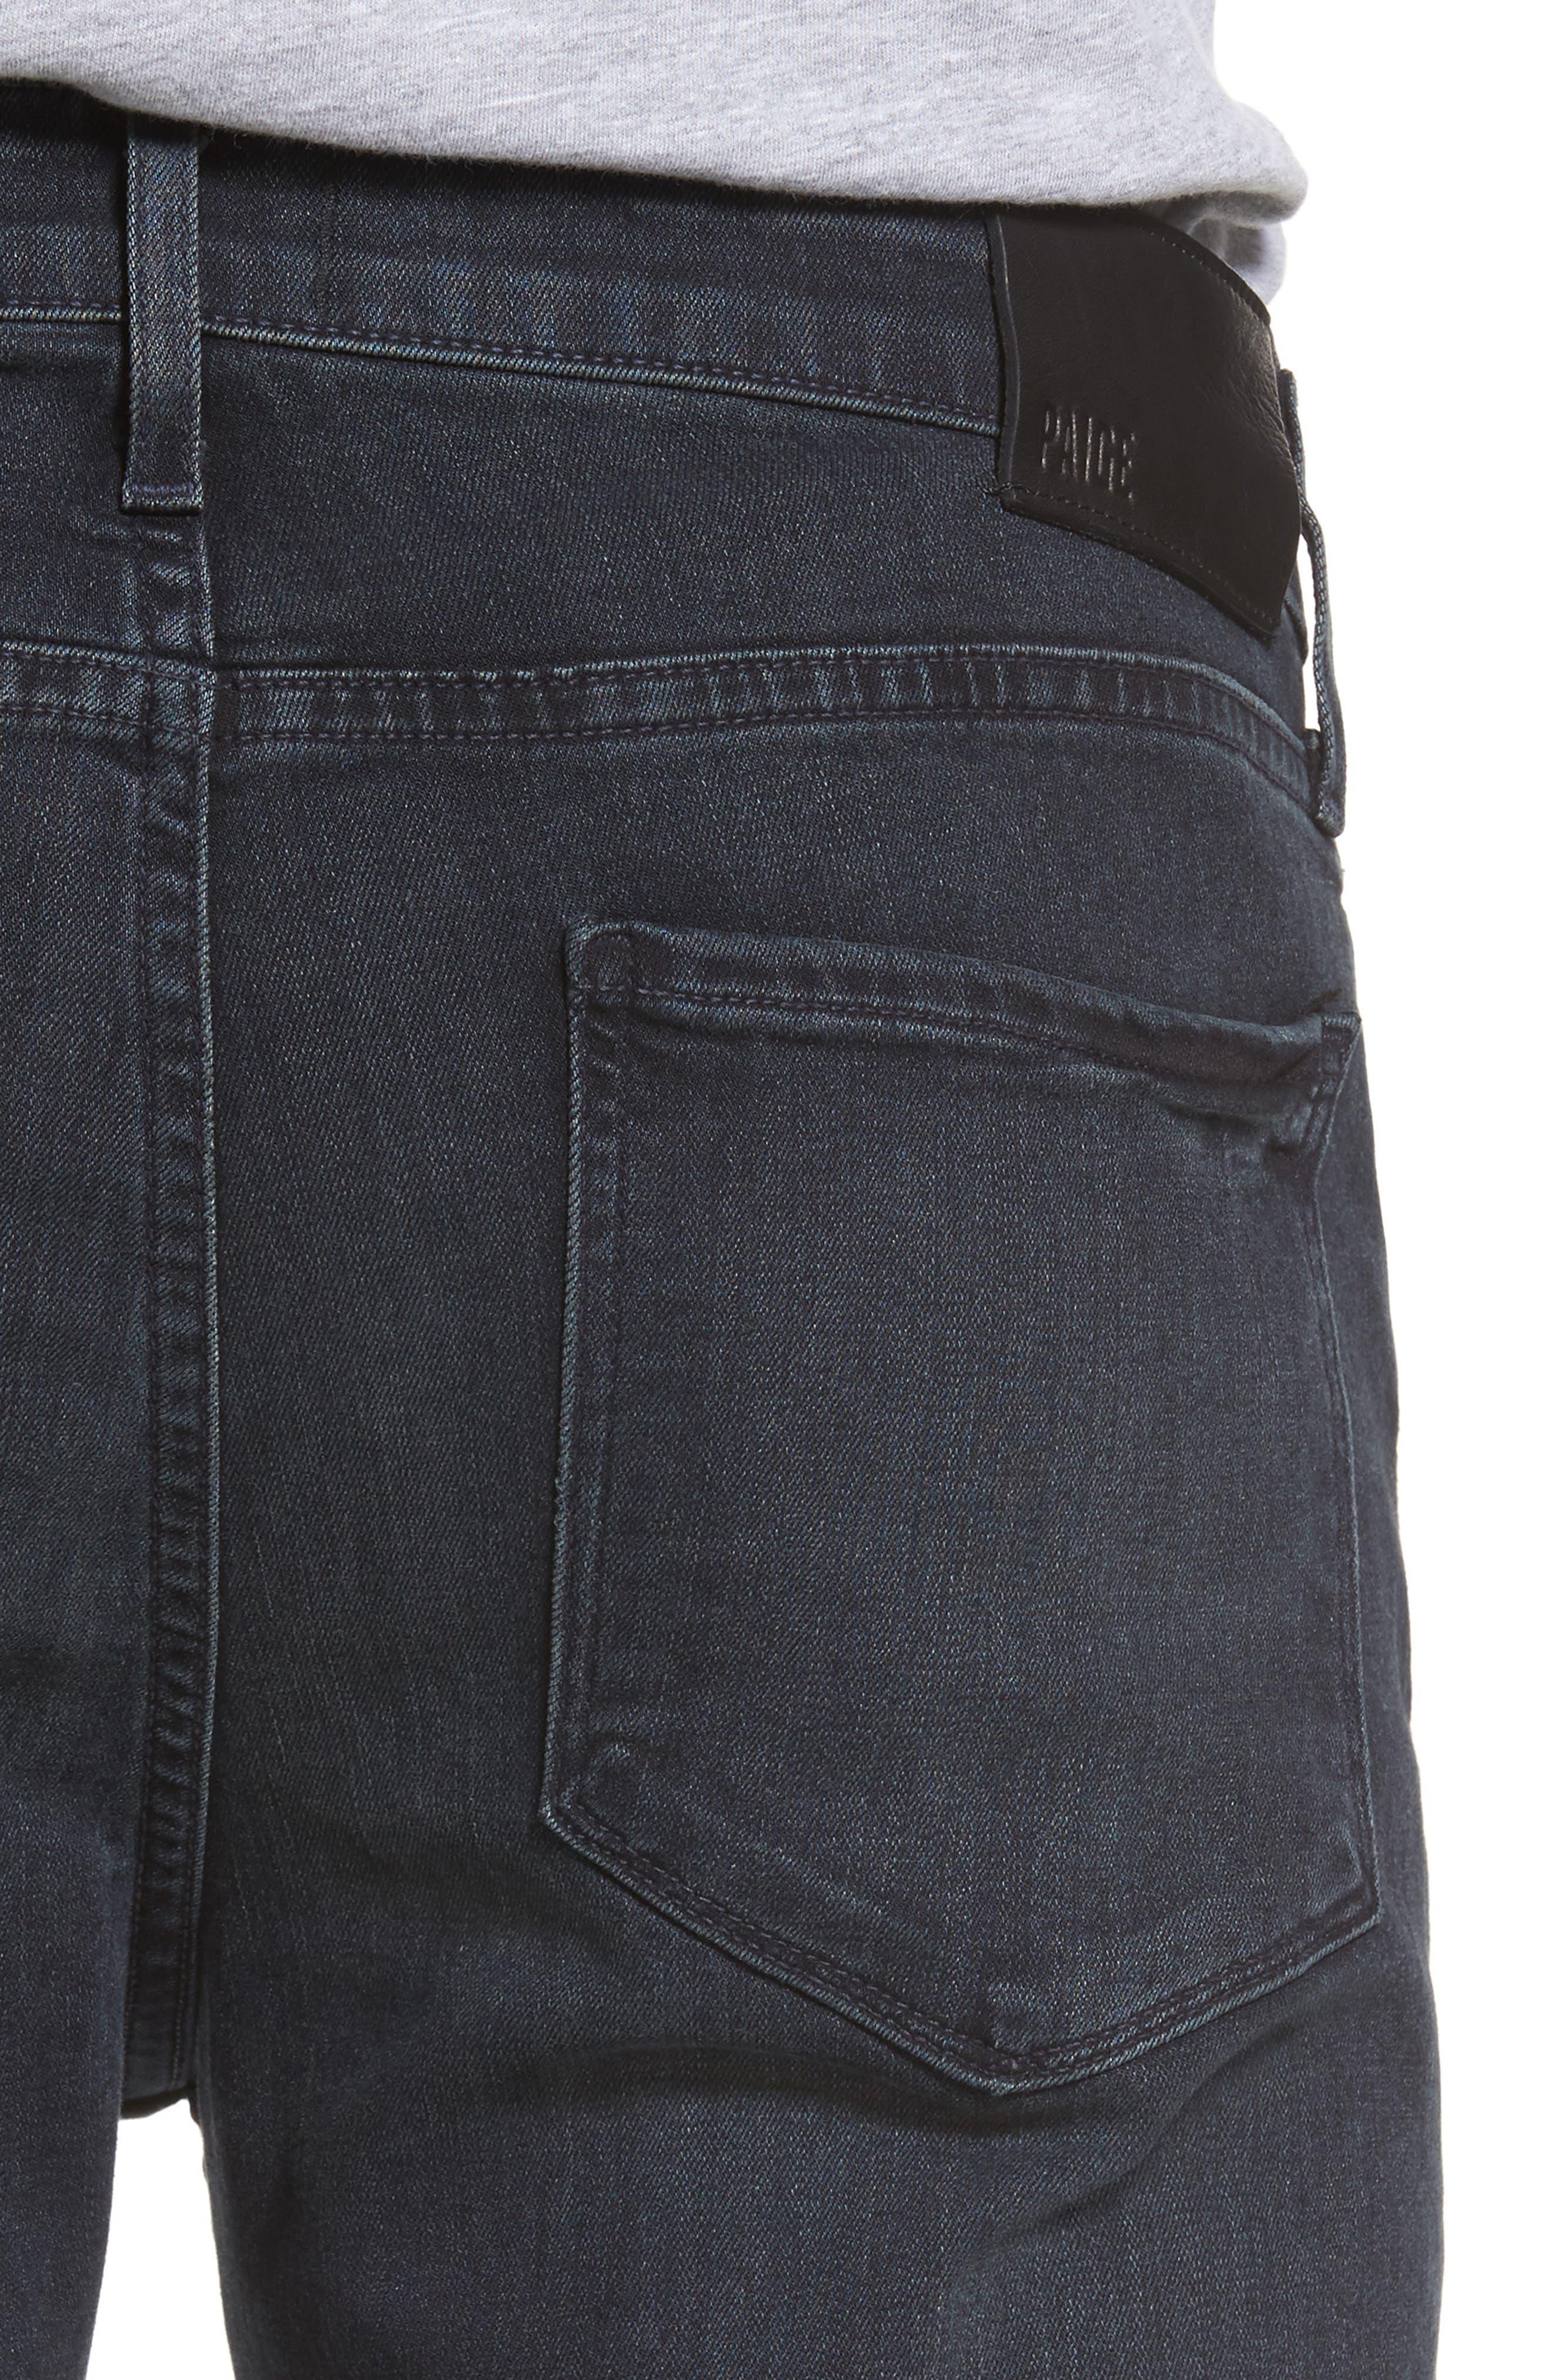 Transcend - Croft Skinny Fit Jeans,                             Alternate thumbnail 4, color,                             Beckett